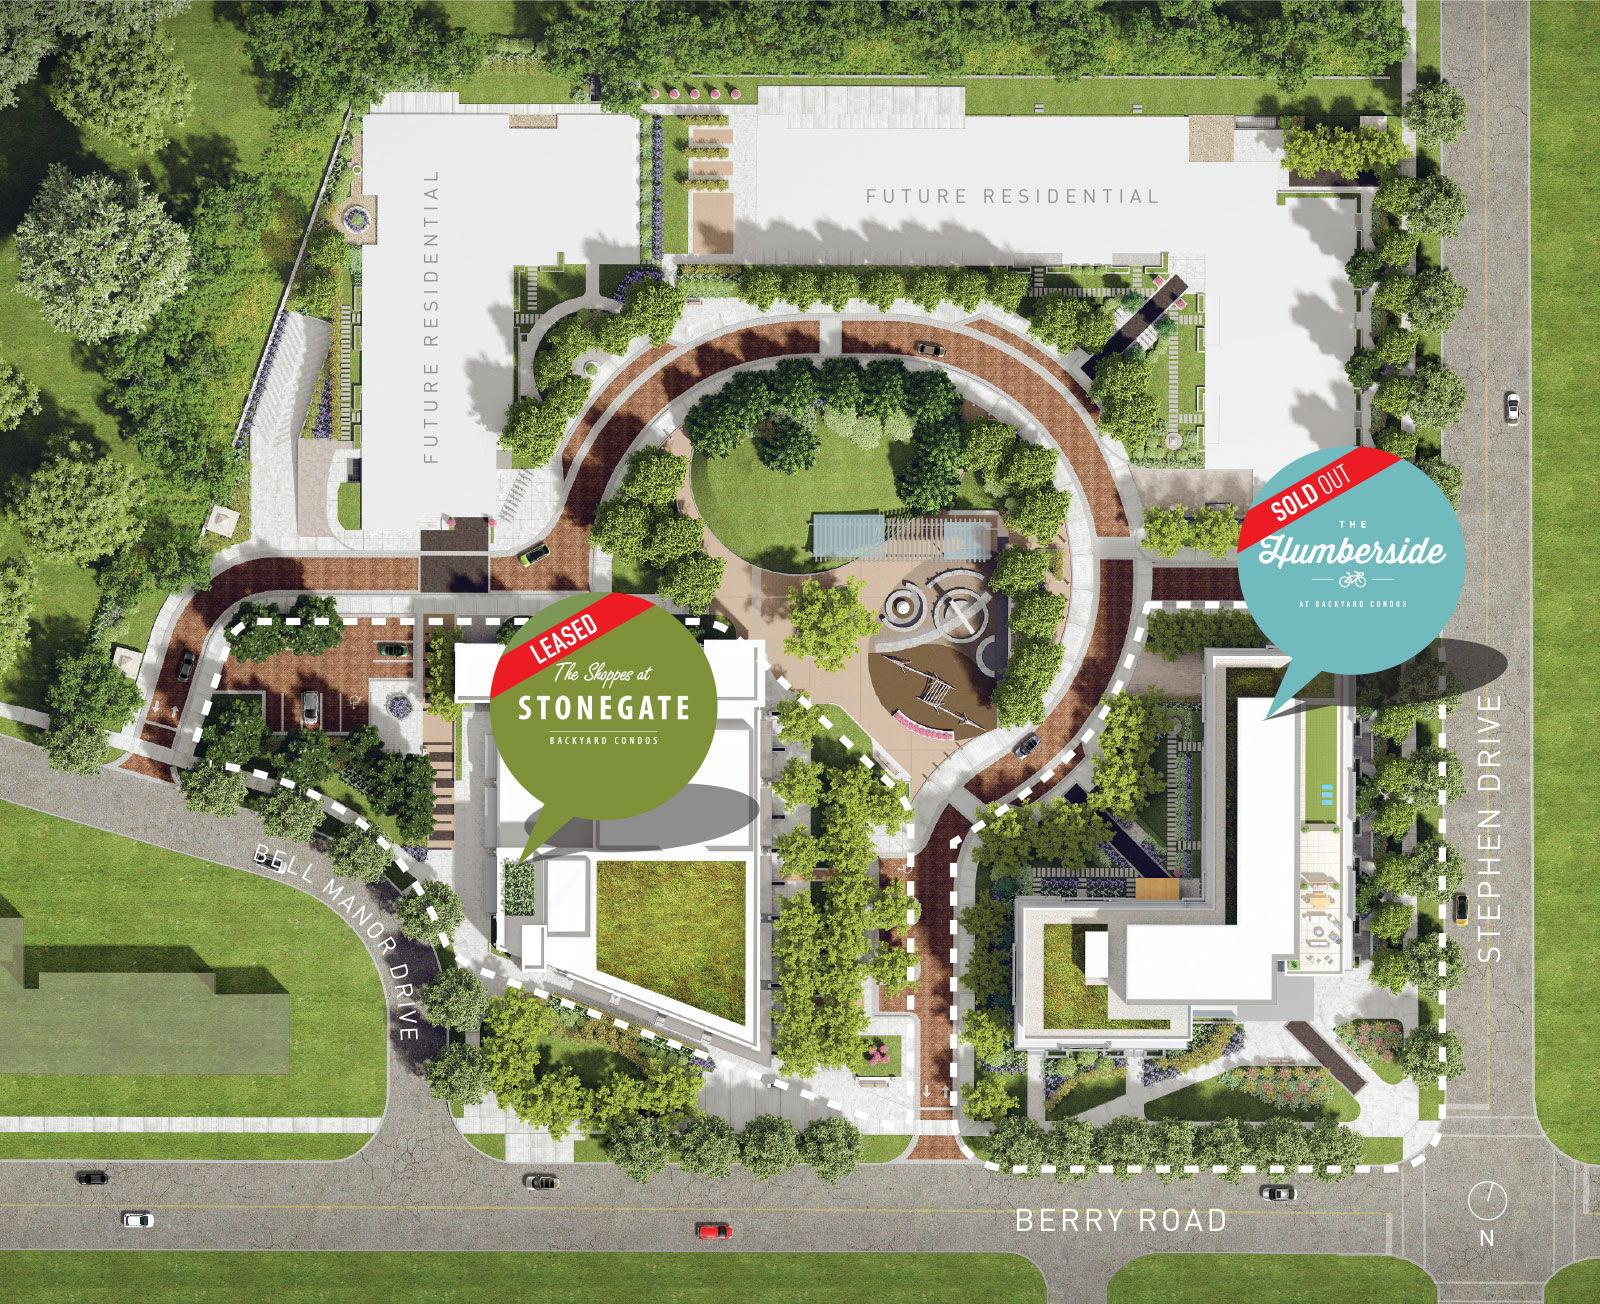 Site plan for Backyard Neighbourhood Condos in Etobicoke, Ontario